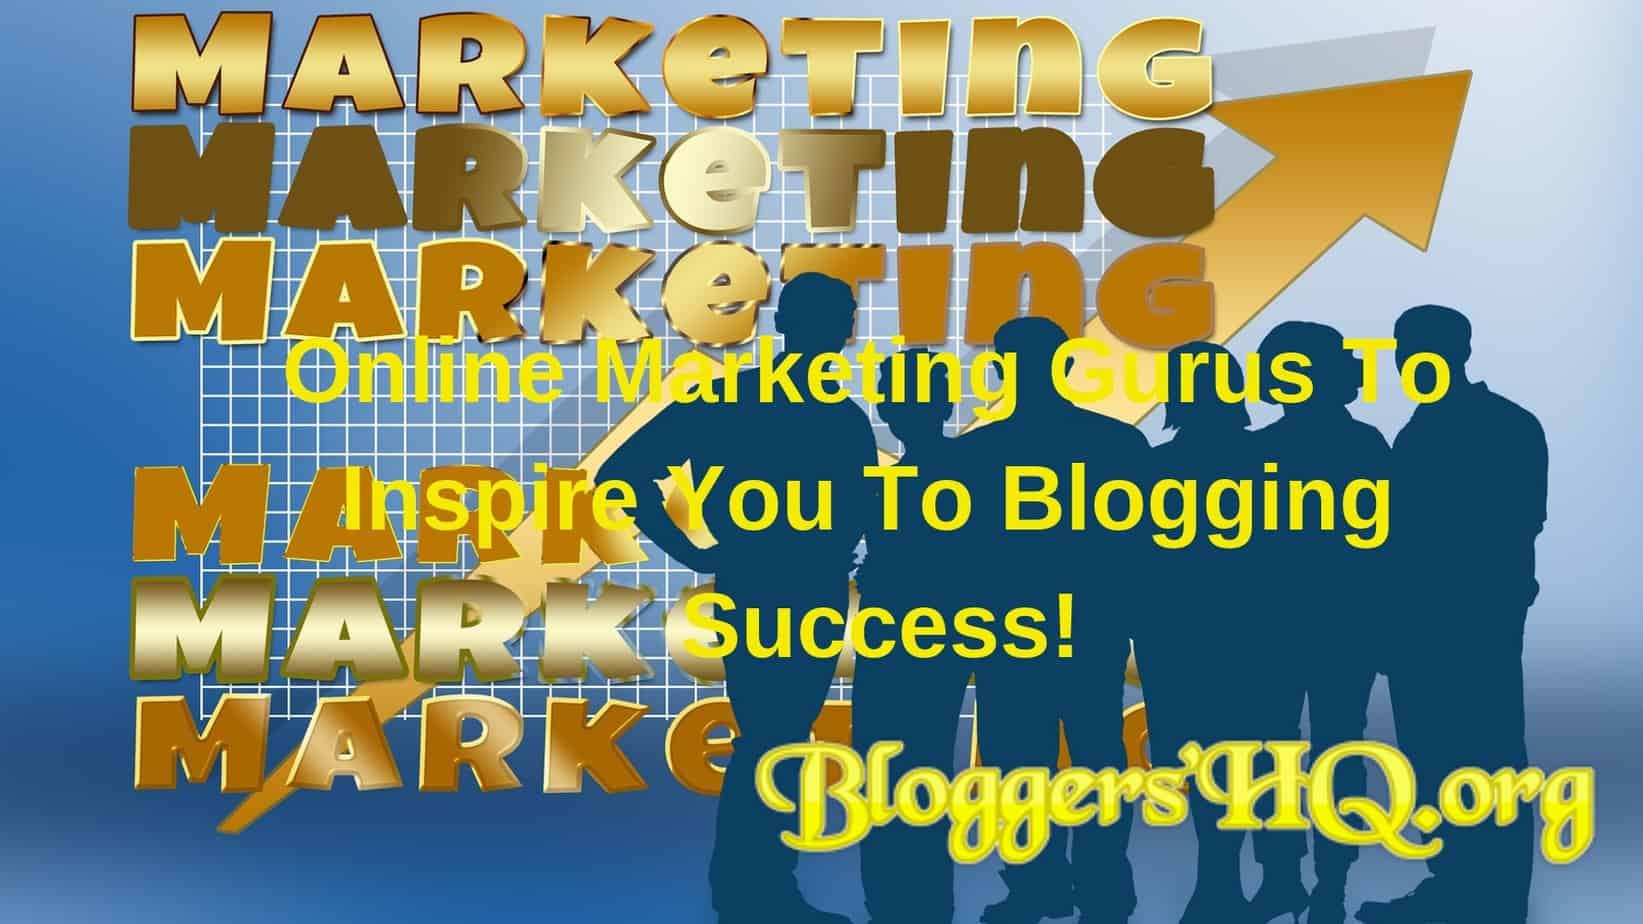 Marketing Gurus Featured